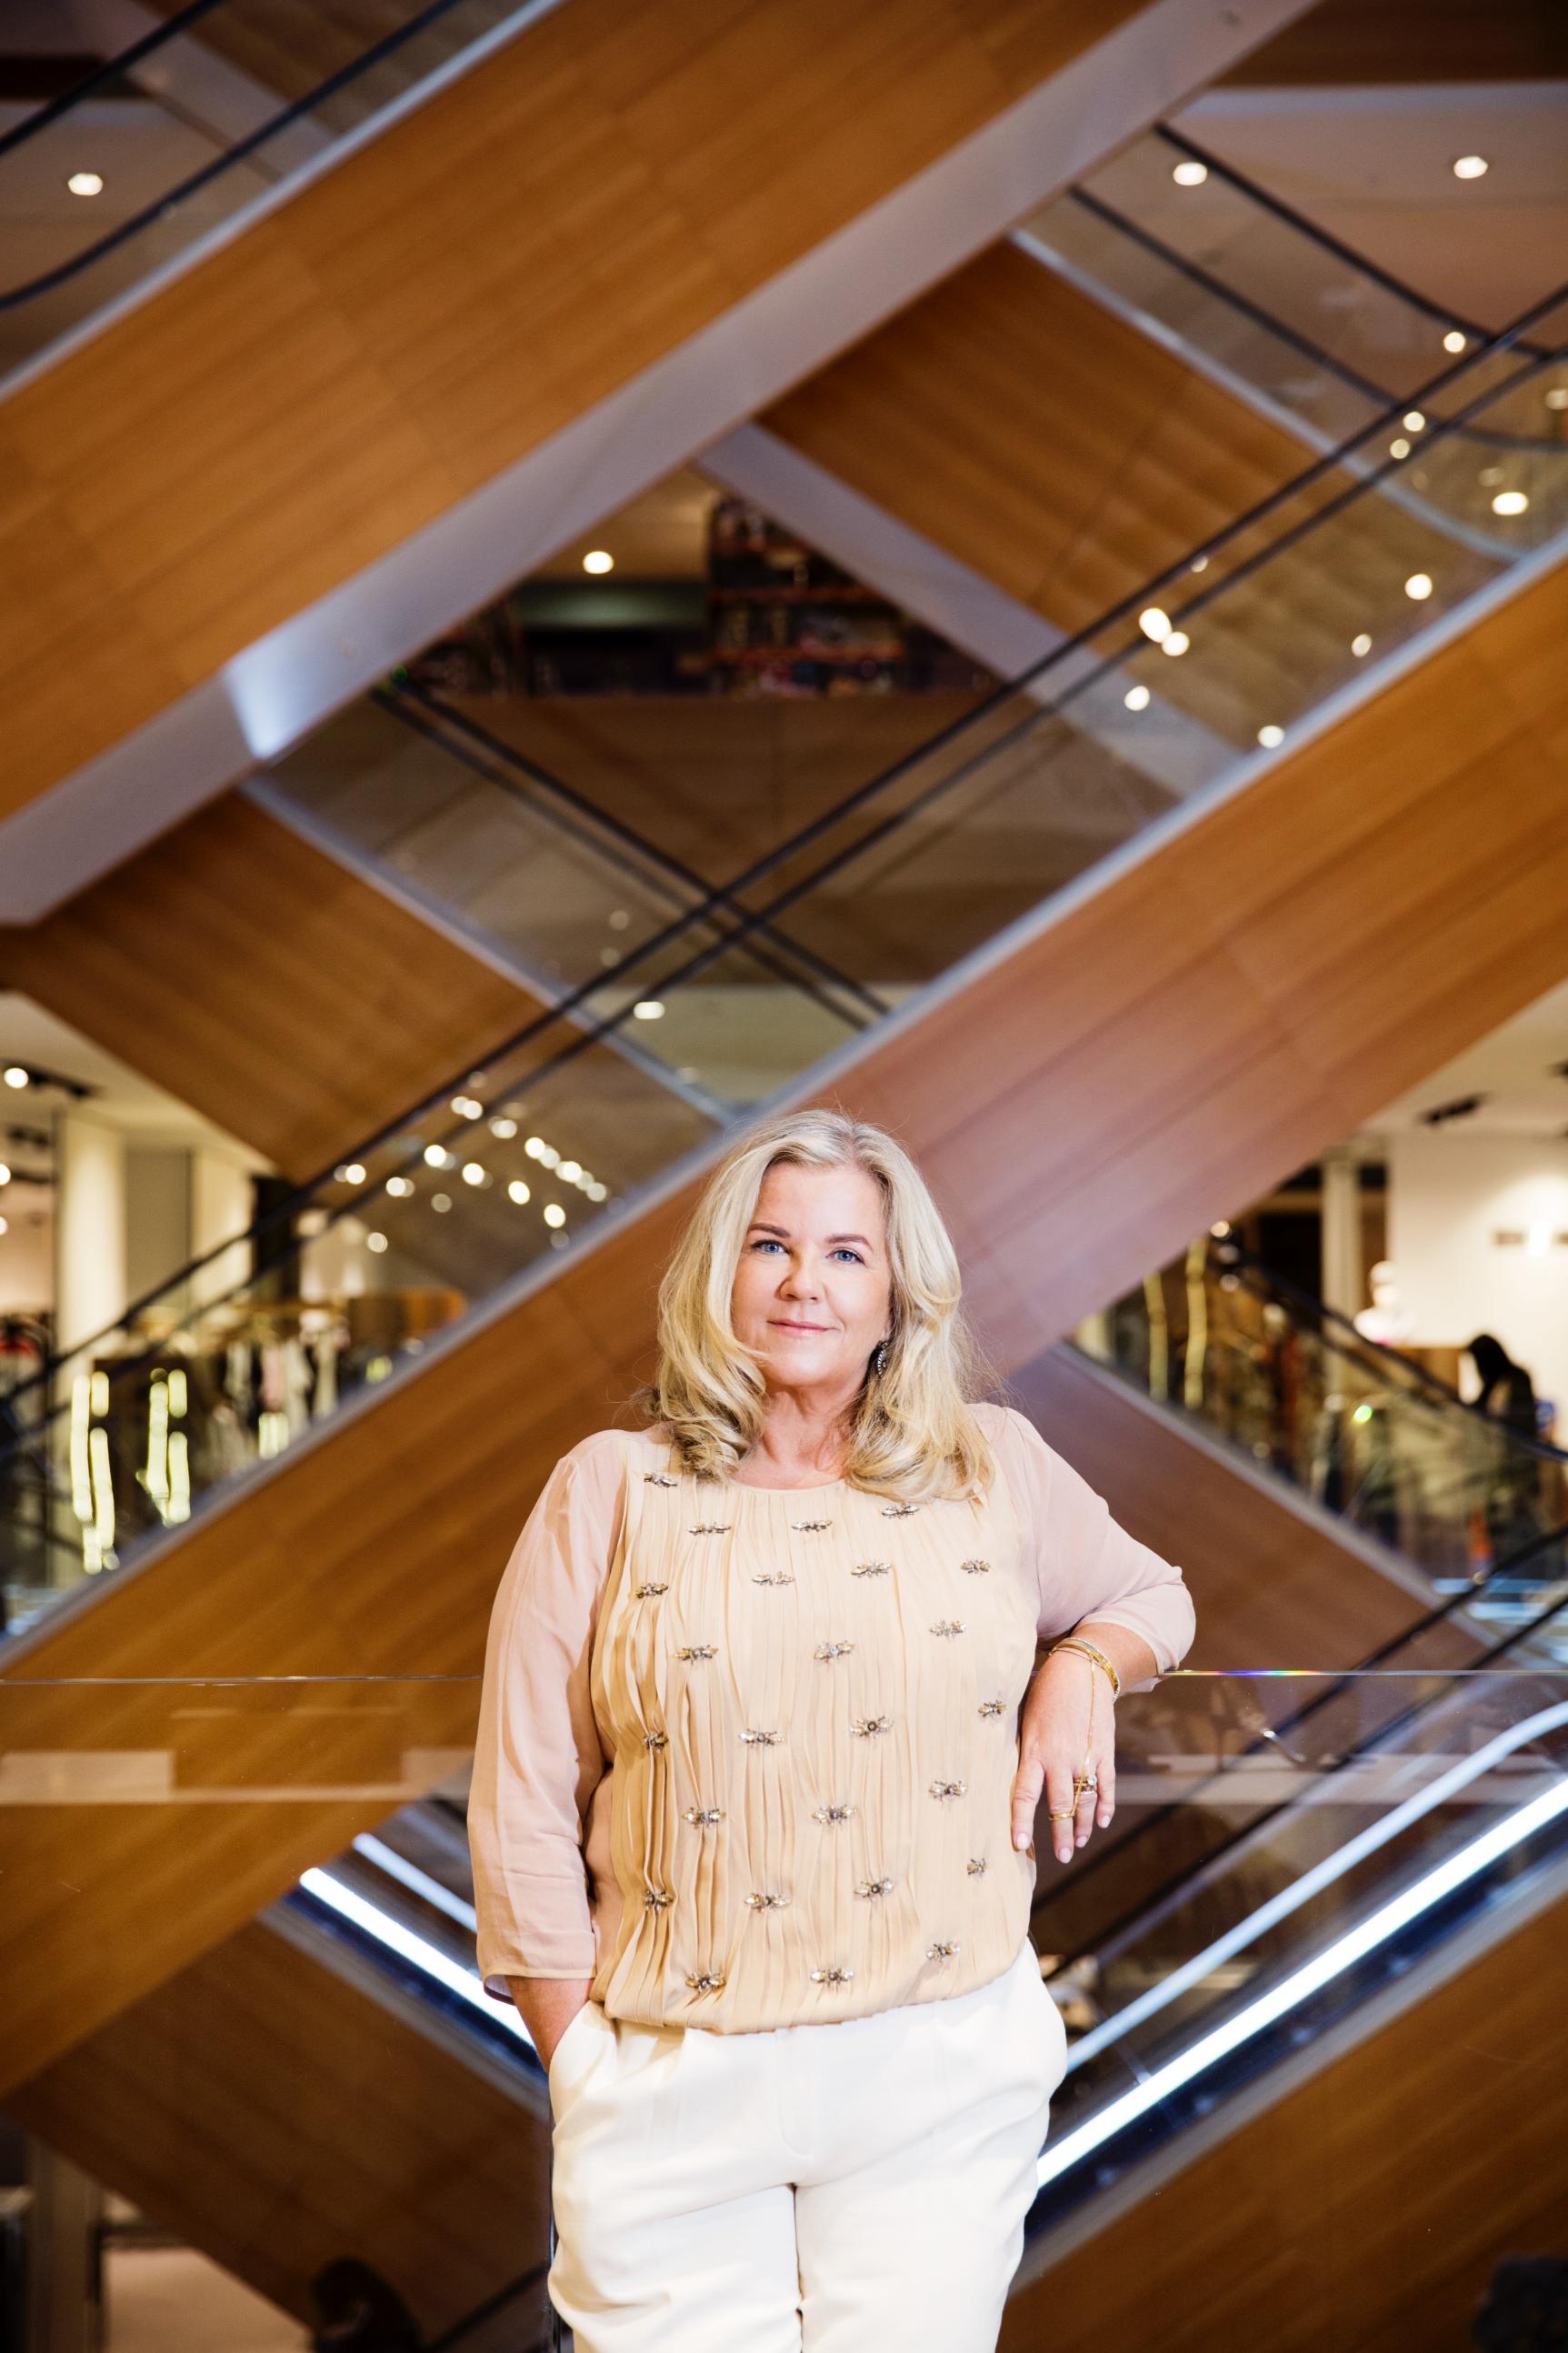 CEO i ILLUM Jeanette Aaen om kvinder i ledelse